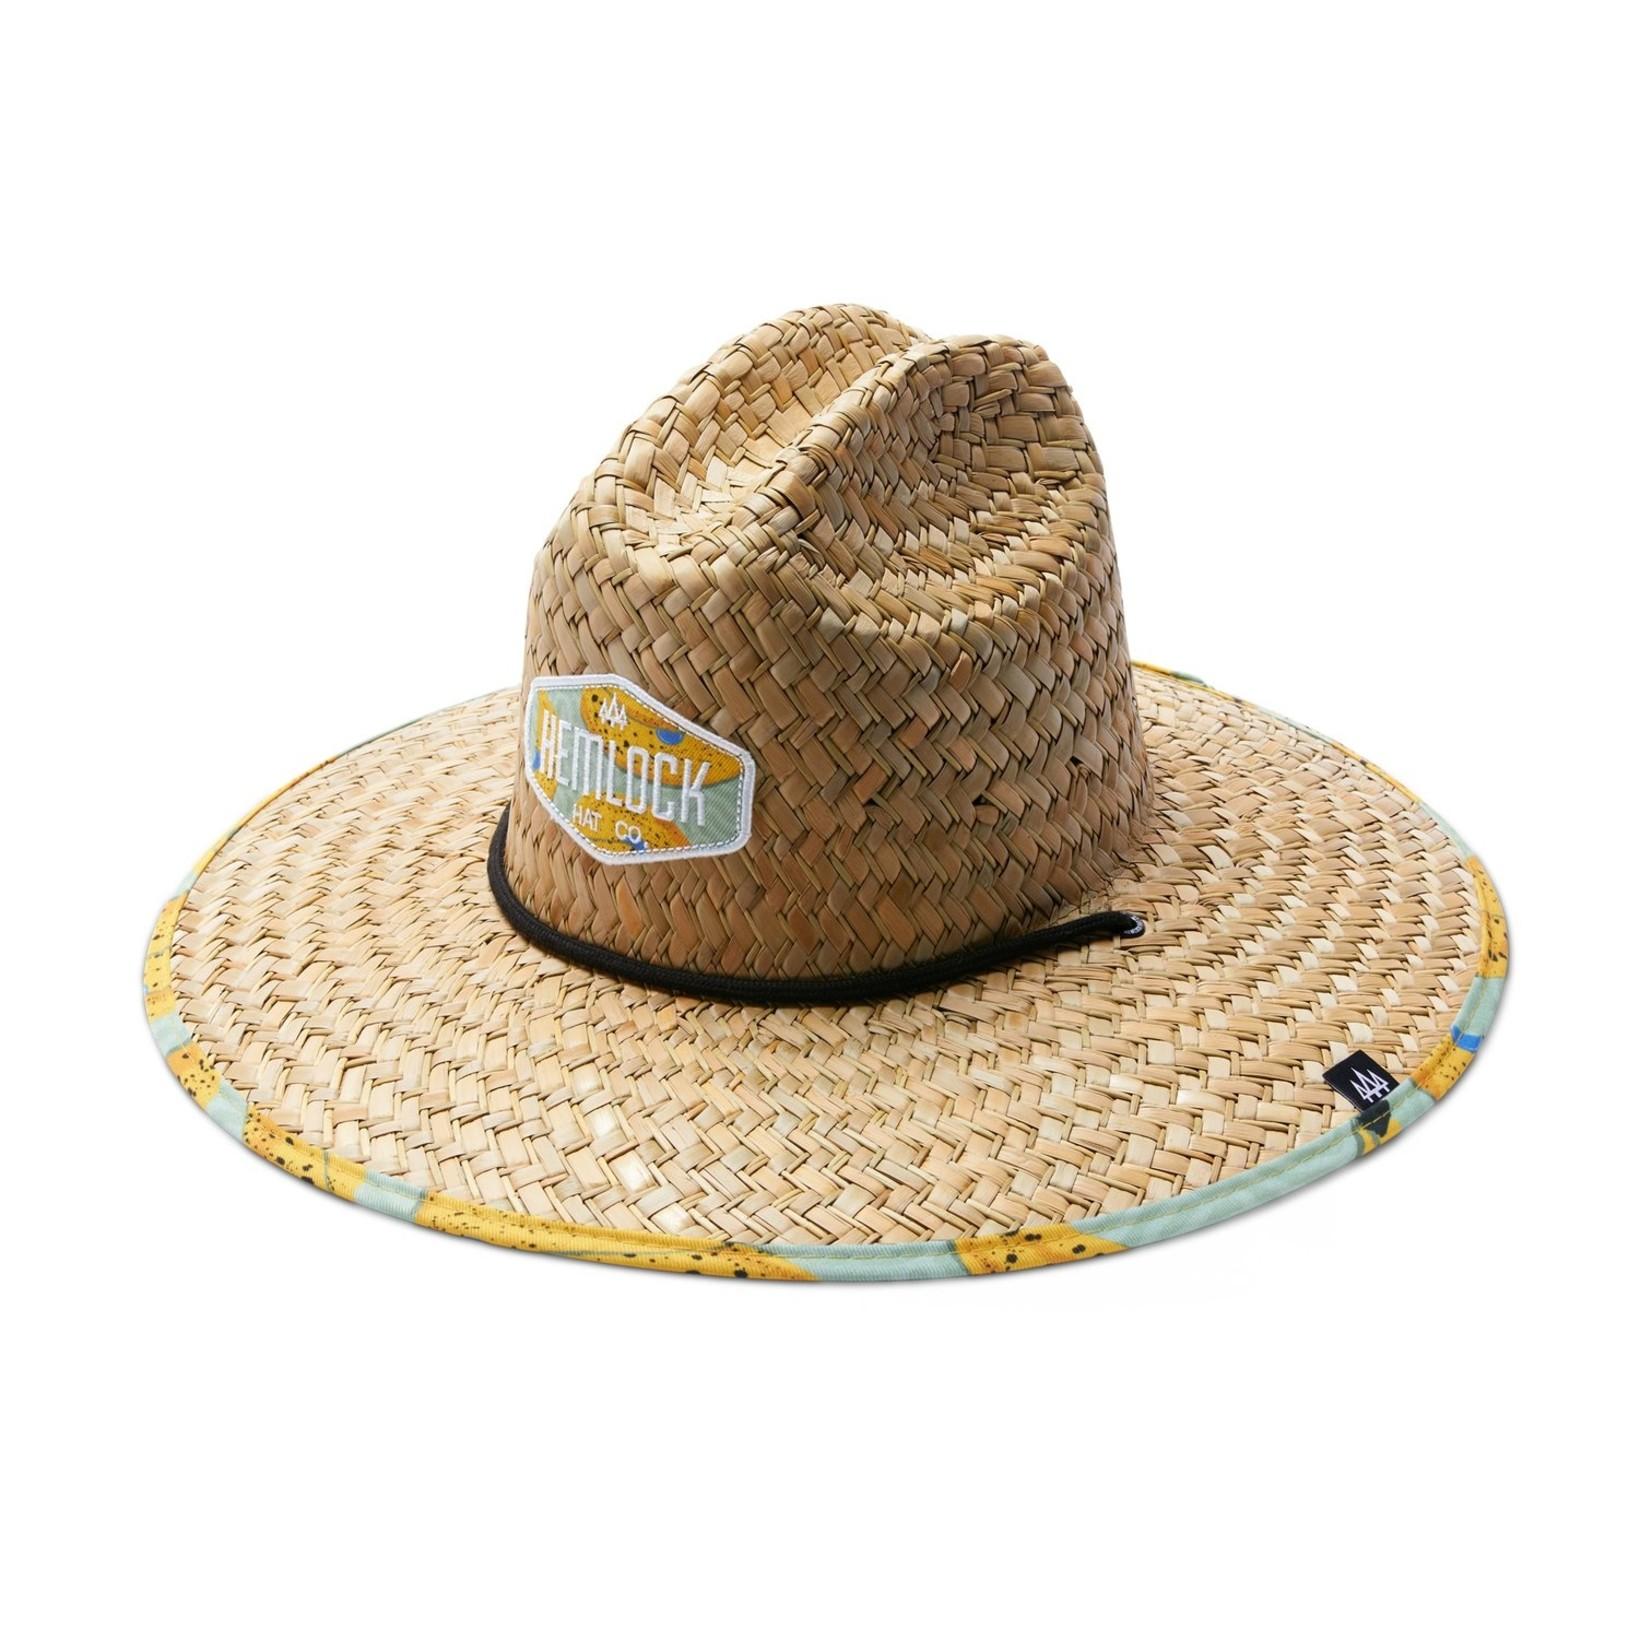 Hemlock Hat Co. Hemlock Hat Co. - Peel